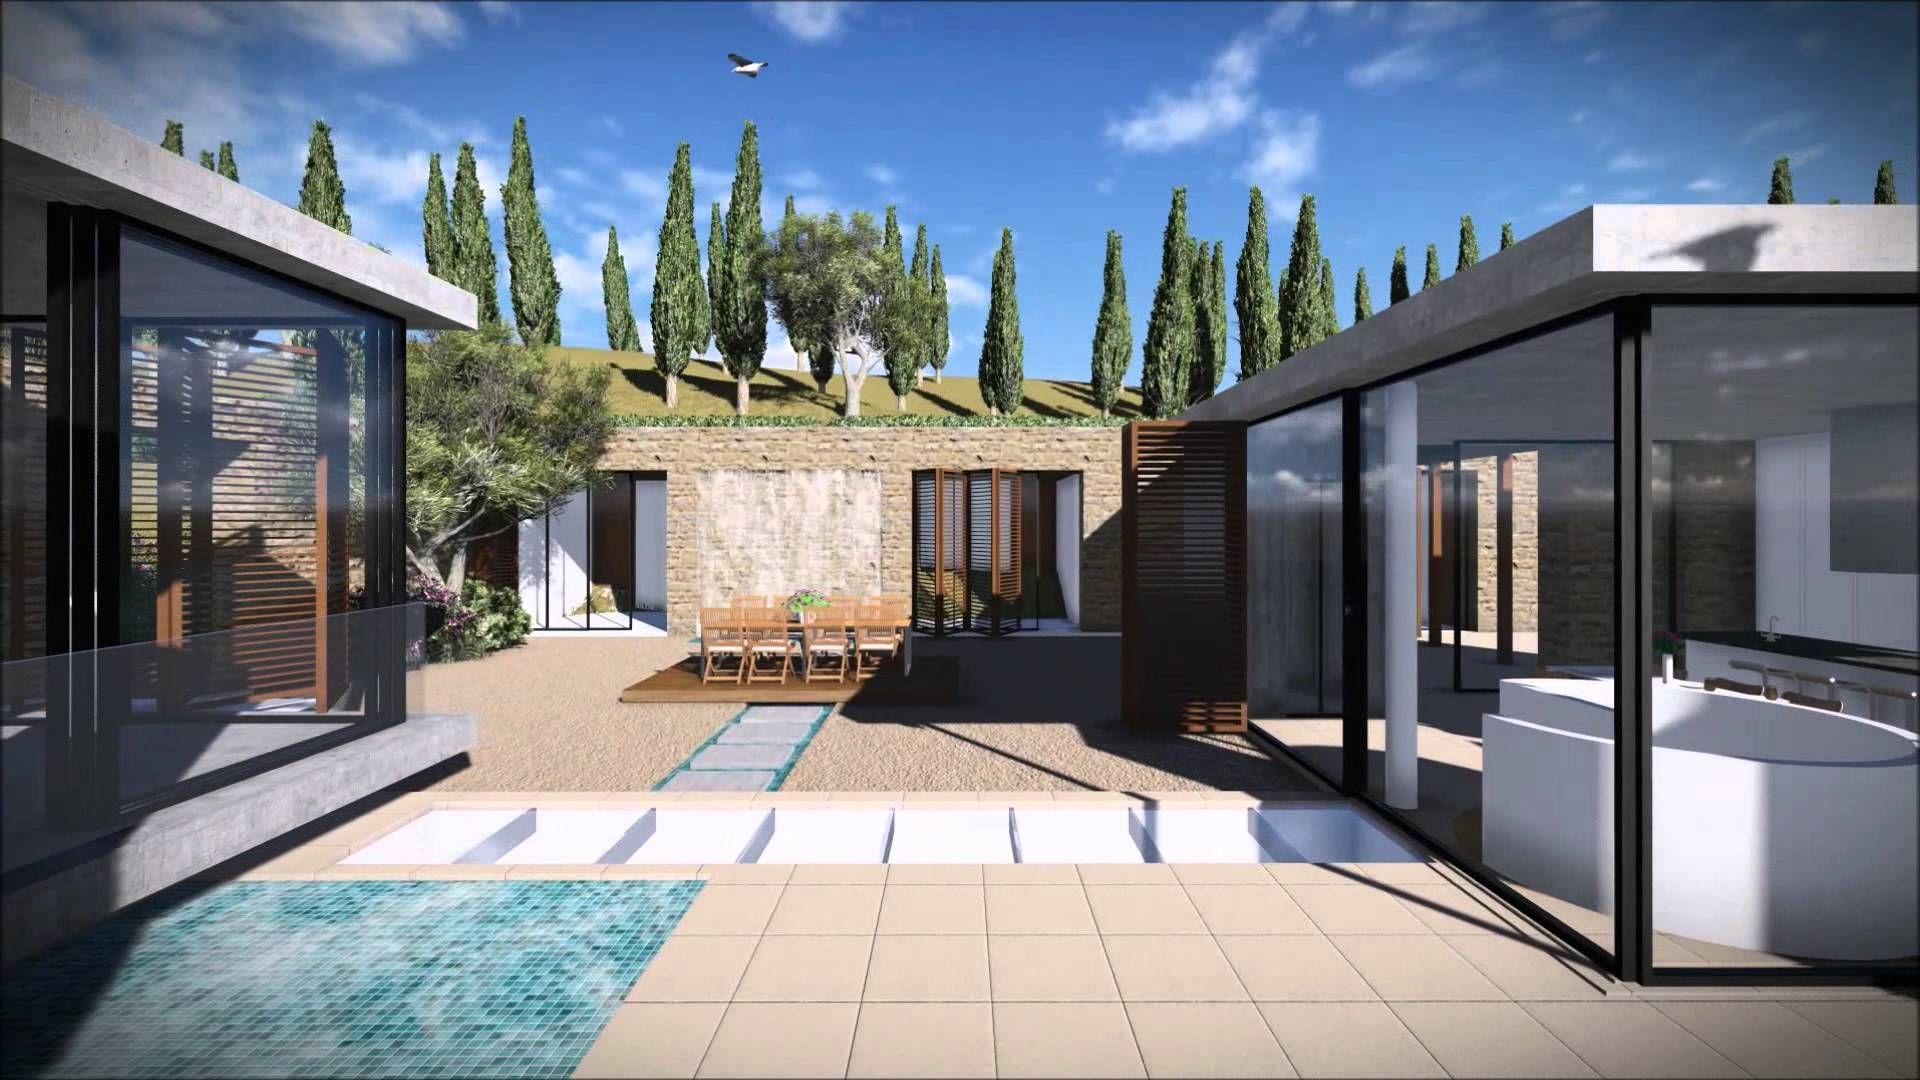 Headcorn minimalist house - Grand Designs